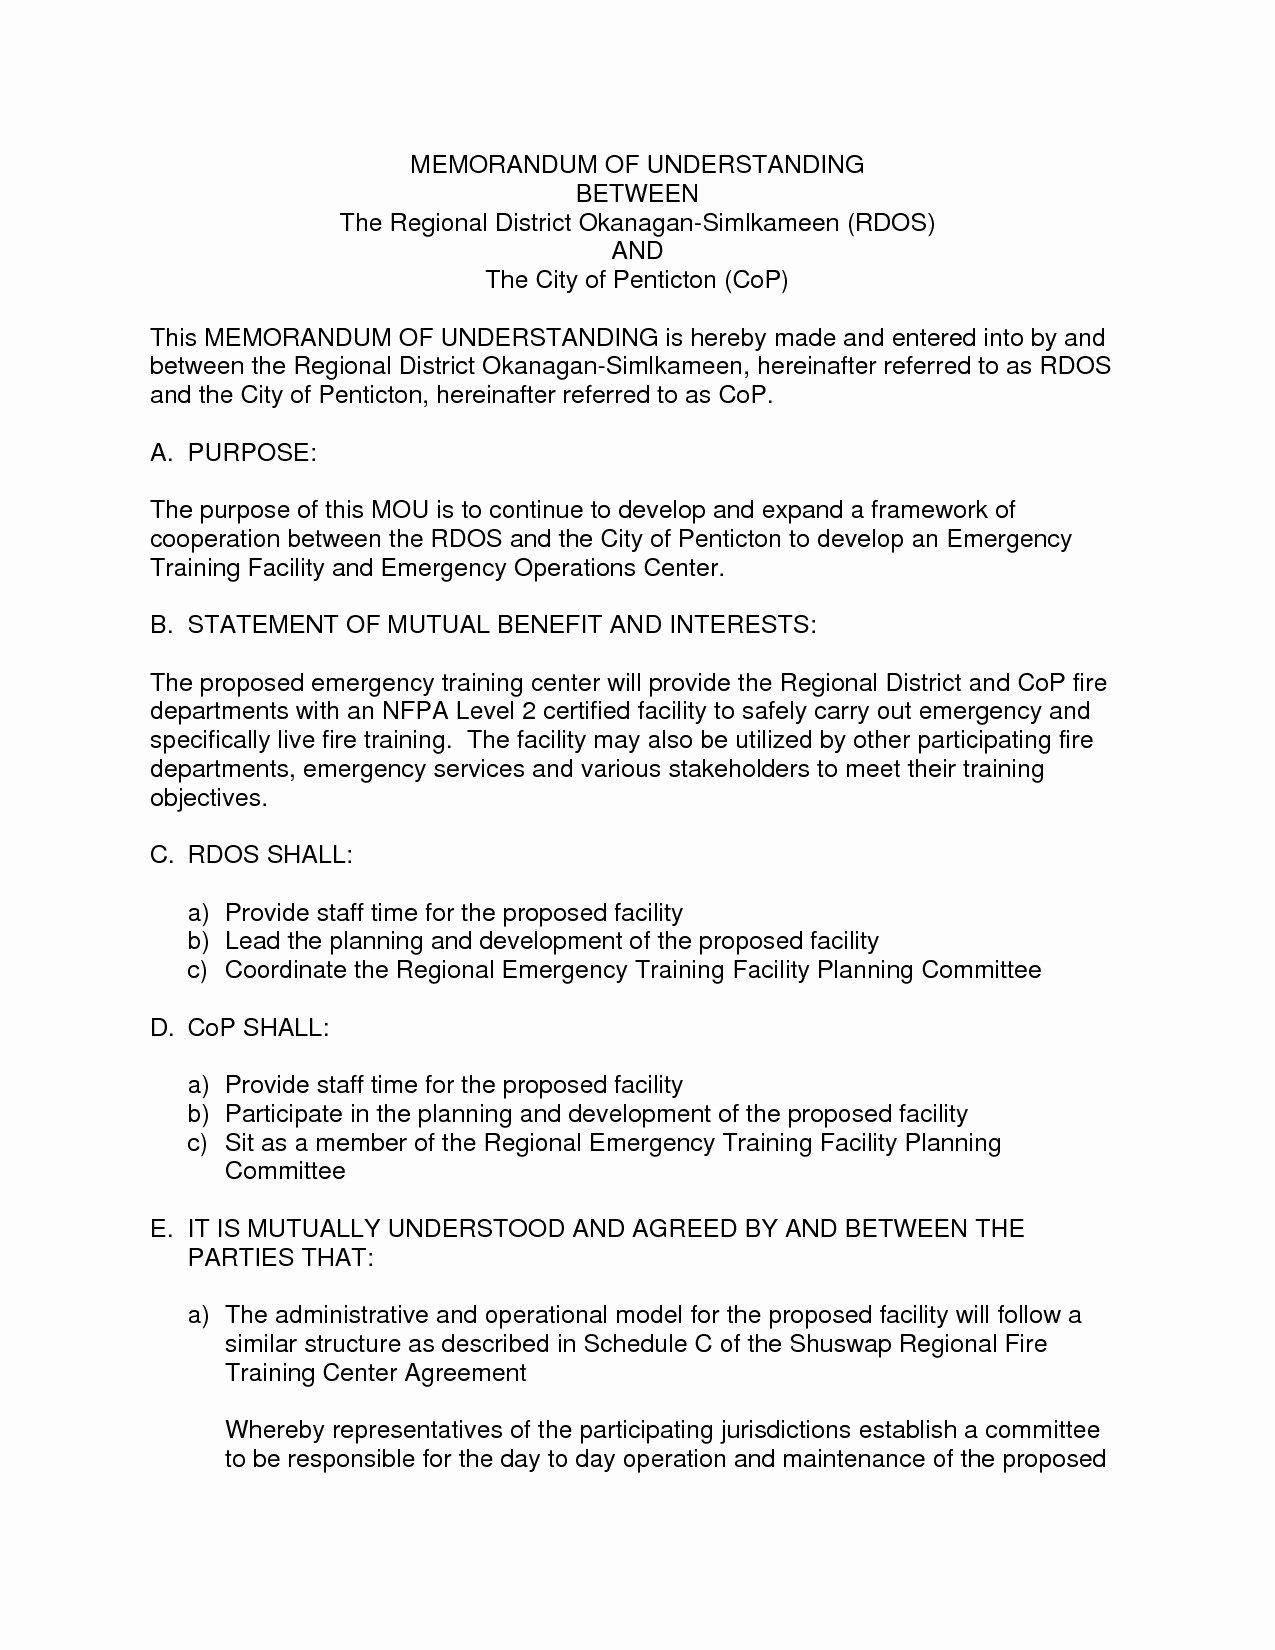 Memorandum Understanding Template Word Beepmunk